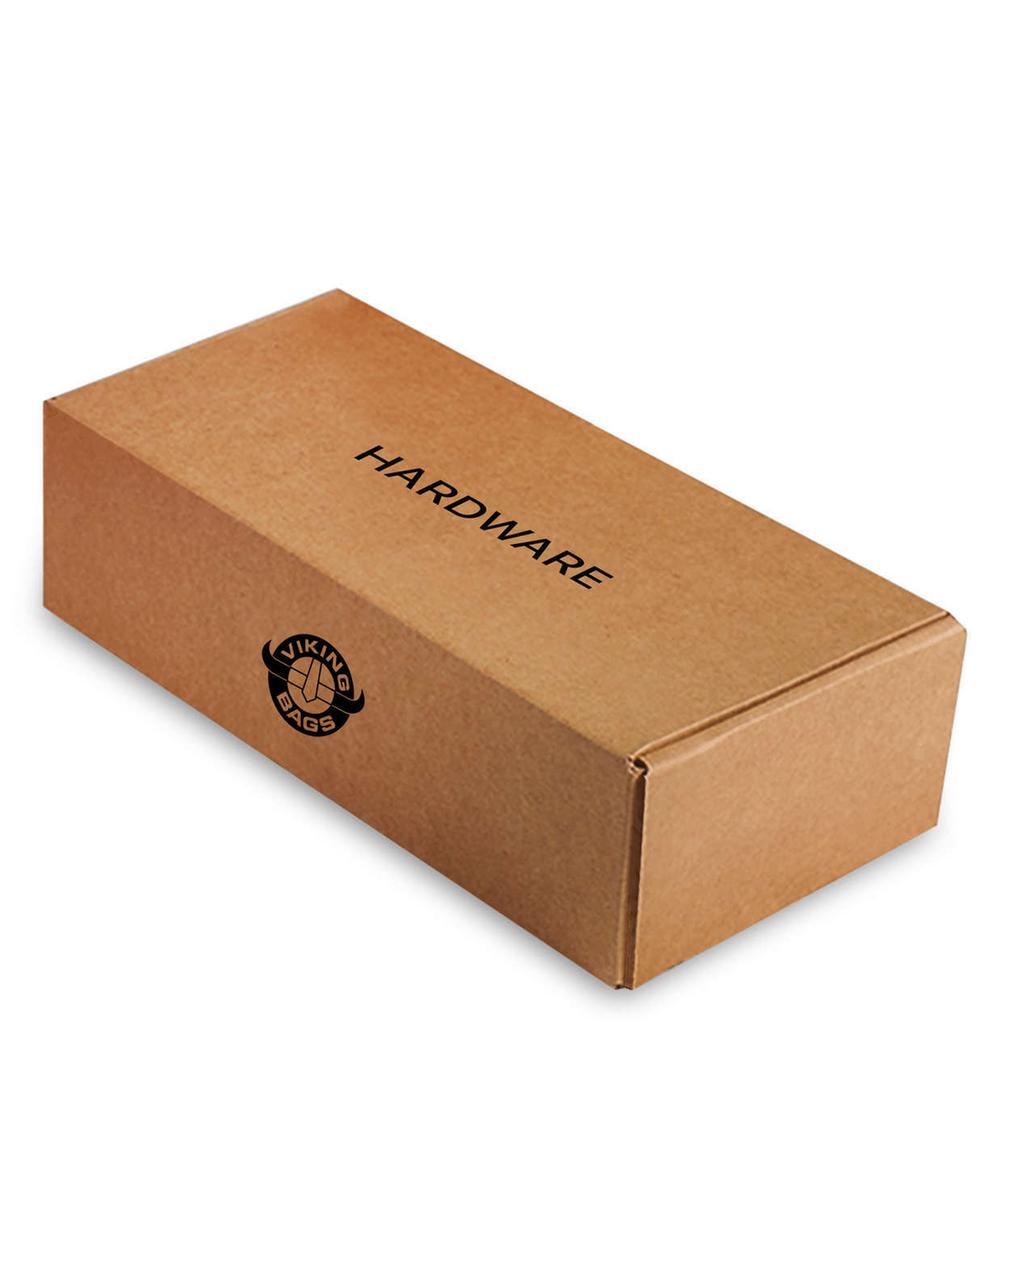 Honda VTX 1800 S Viking Lamellar Leather Covered Shock Cutout Hard Saddlebag box